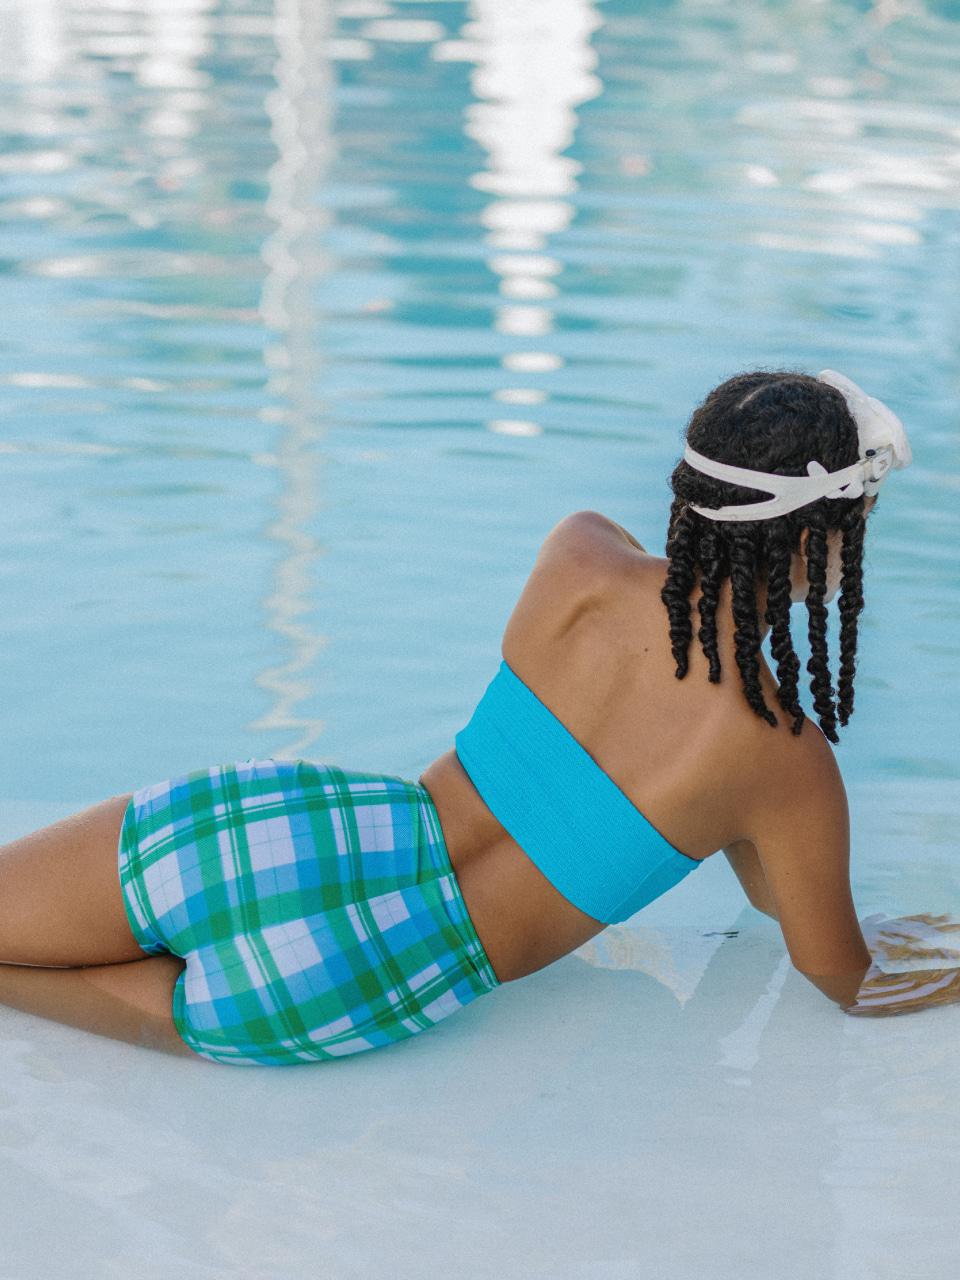 JOLLY HIGH SHORTSswimwear,수영복,비키니,데이즈데이즈,dazedayz,디자이너수영복,디자이너스위웨어,디자이너수영복,리조트웨어,